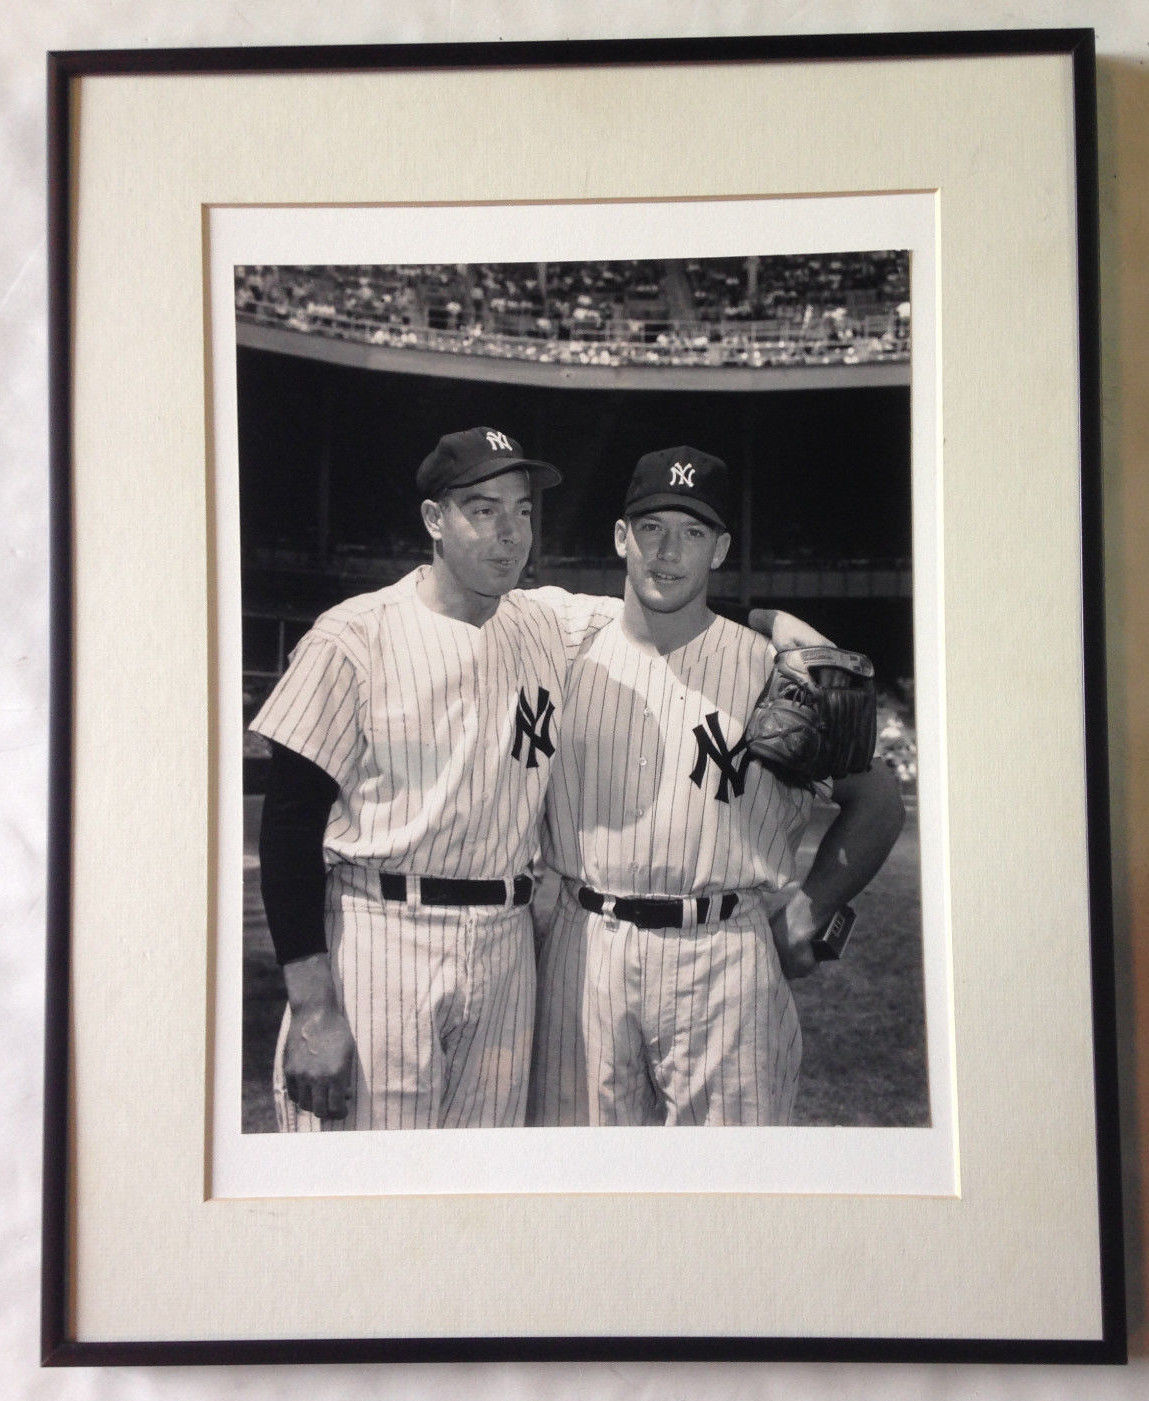 Joe DiMaggio Mickey Mantle framed 11×14 original photo Yankees HOF john scher